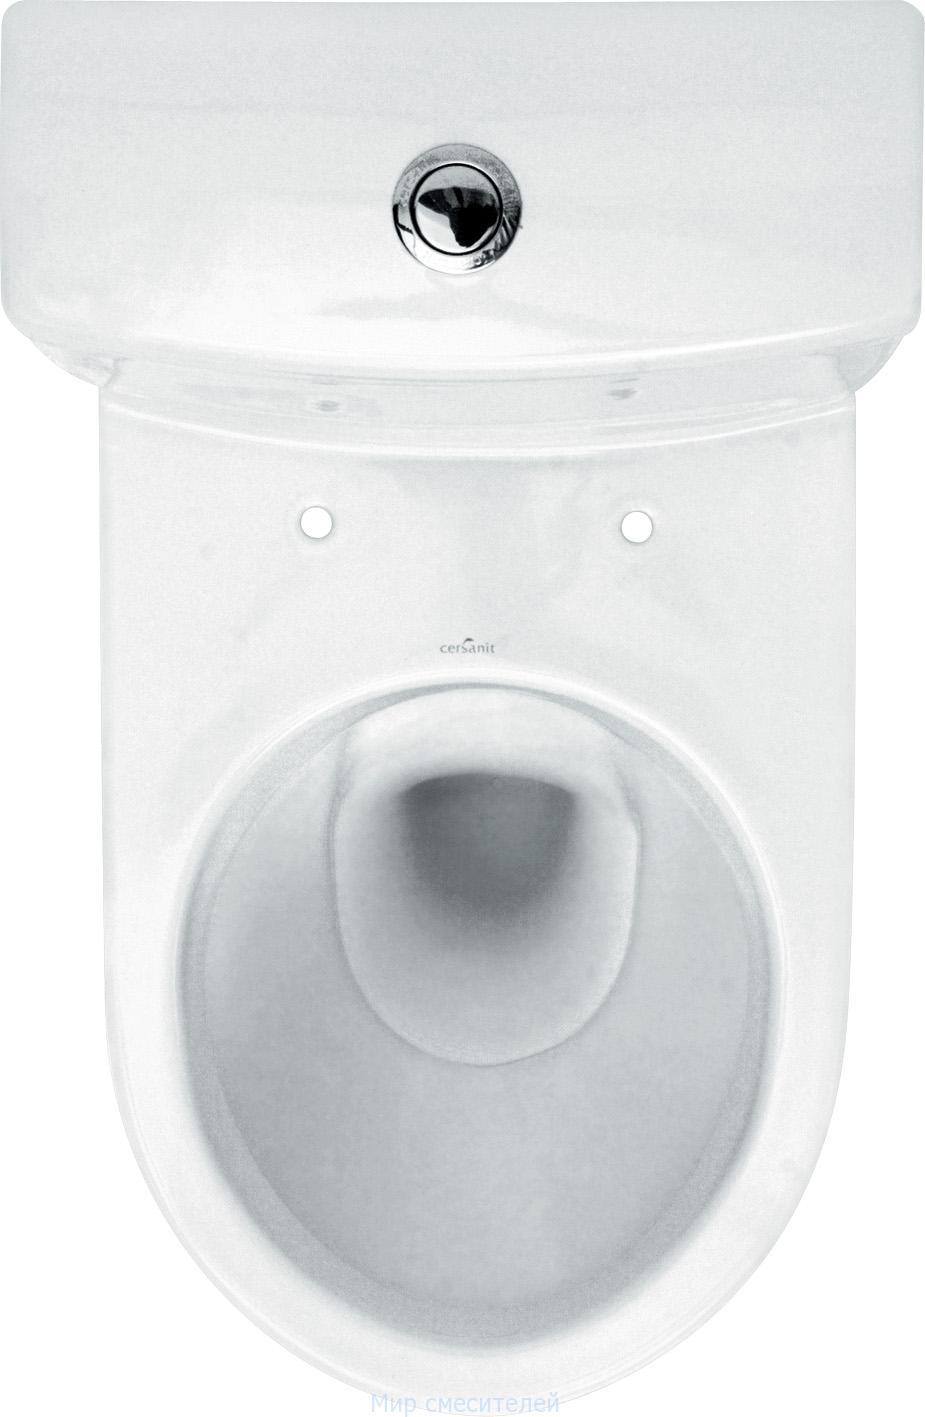 Чаша унитаза Cersanit OLIMPIA OL 010/020 (P-MK-OL010/O020)